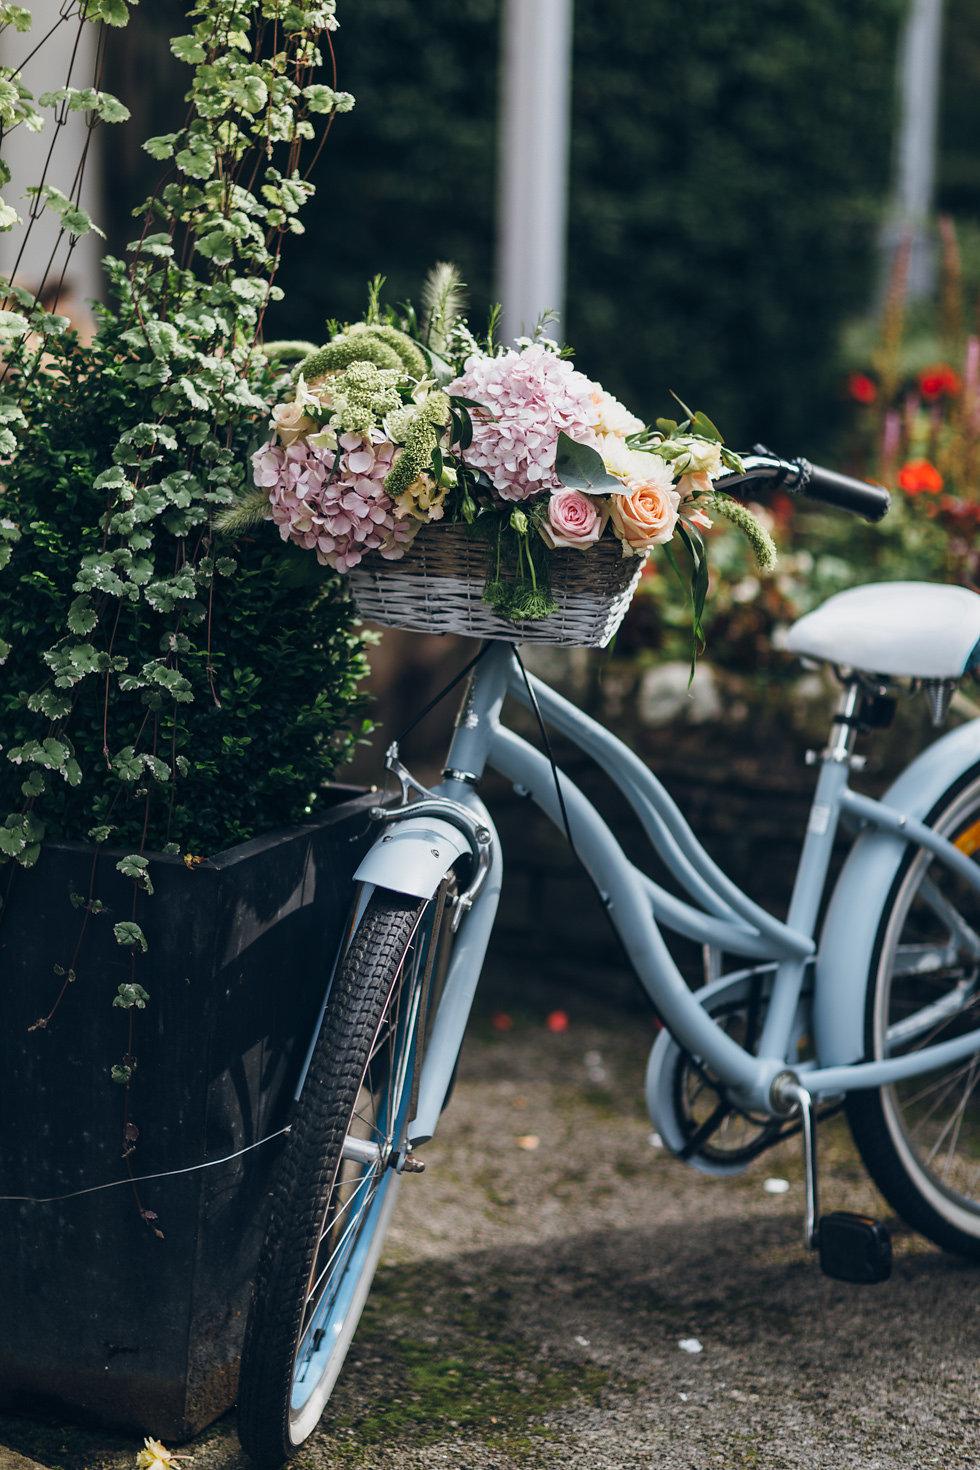 Blue Bicycle & Basket